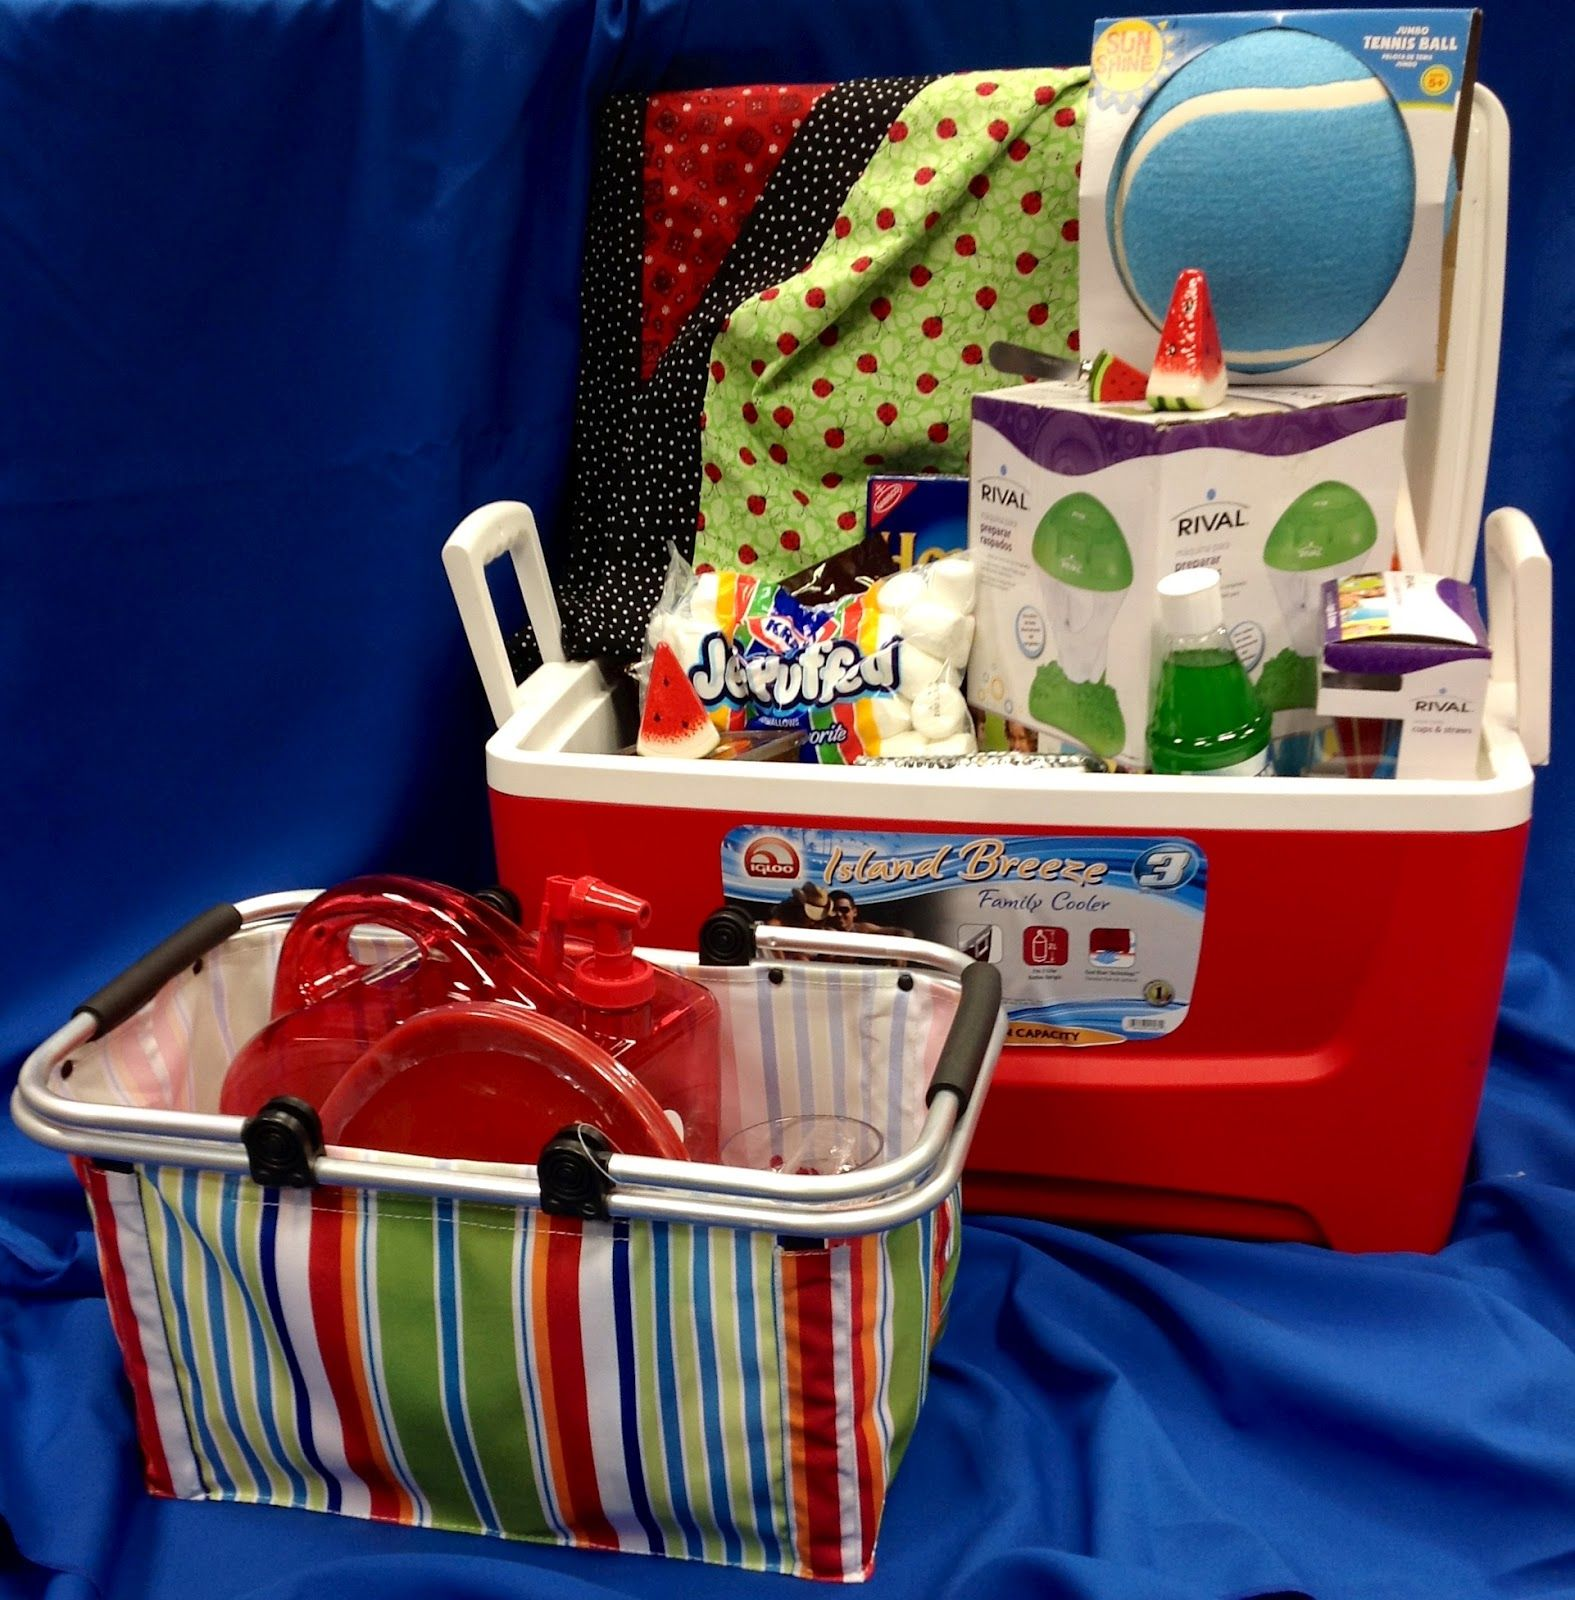 Fundraiser Gift Ideas: Basket Ideas For Raffle - Google Search